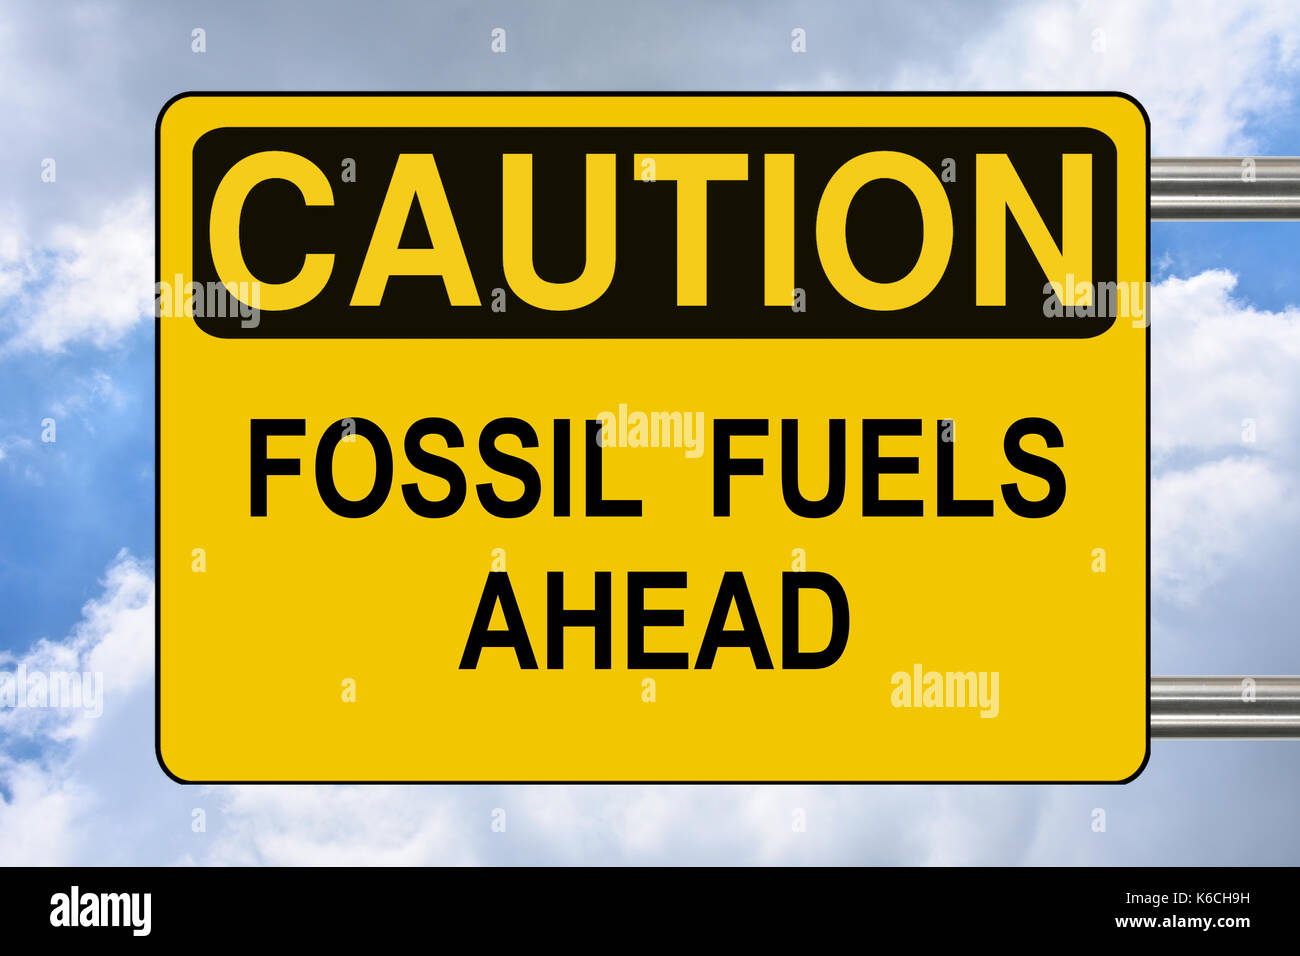 L'avenir des combustibles fossiles, d'avertissement jaune road sign Photo Stock